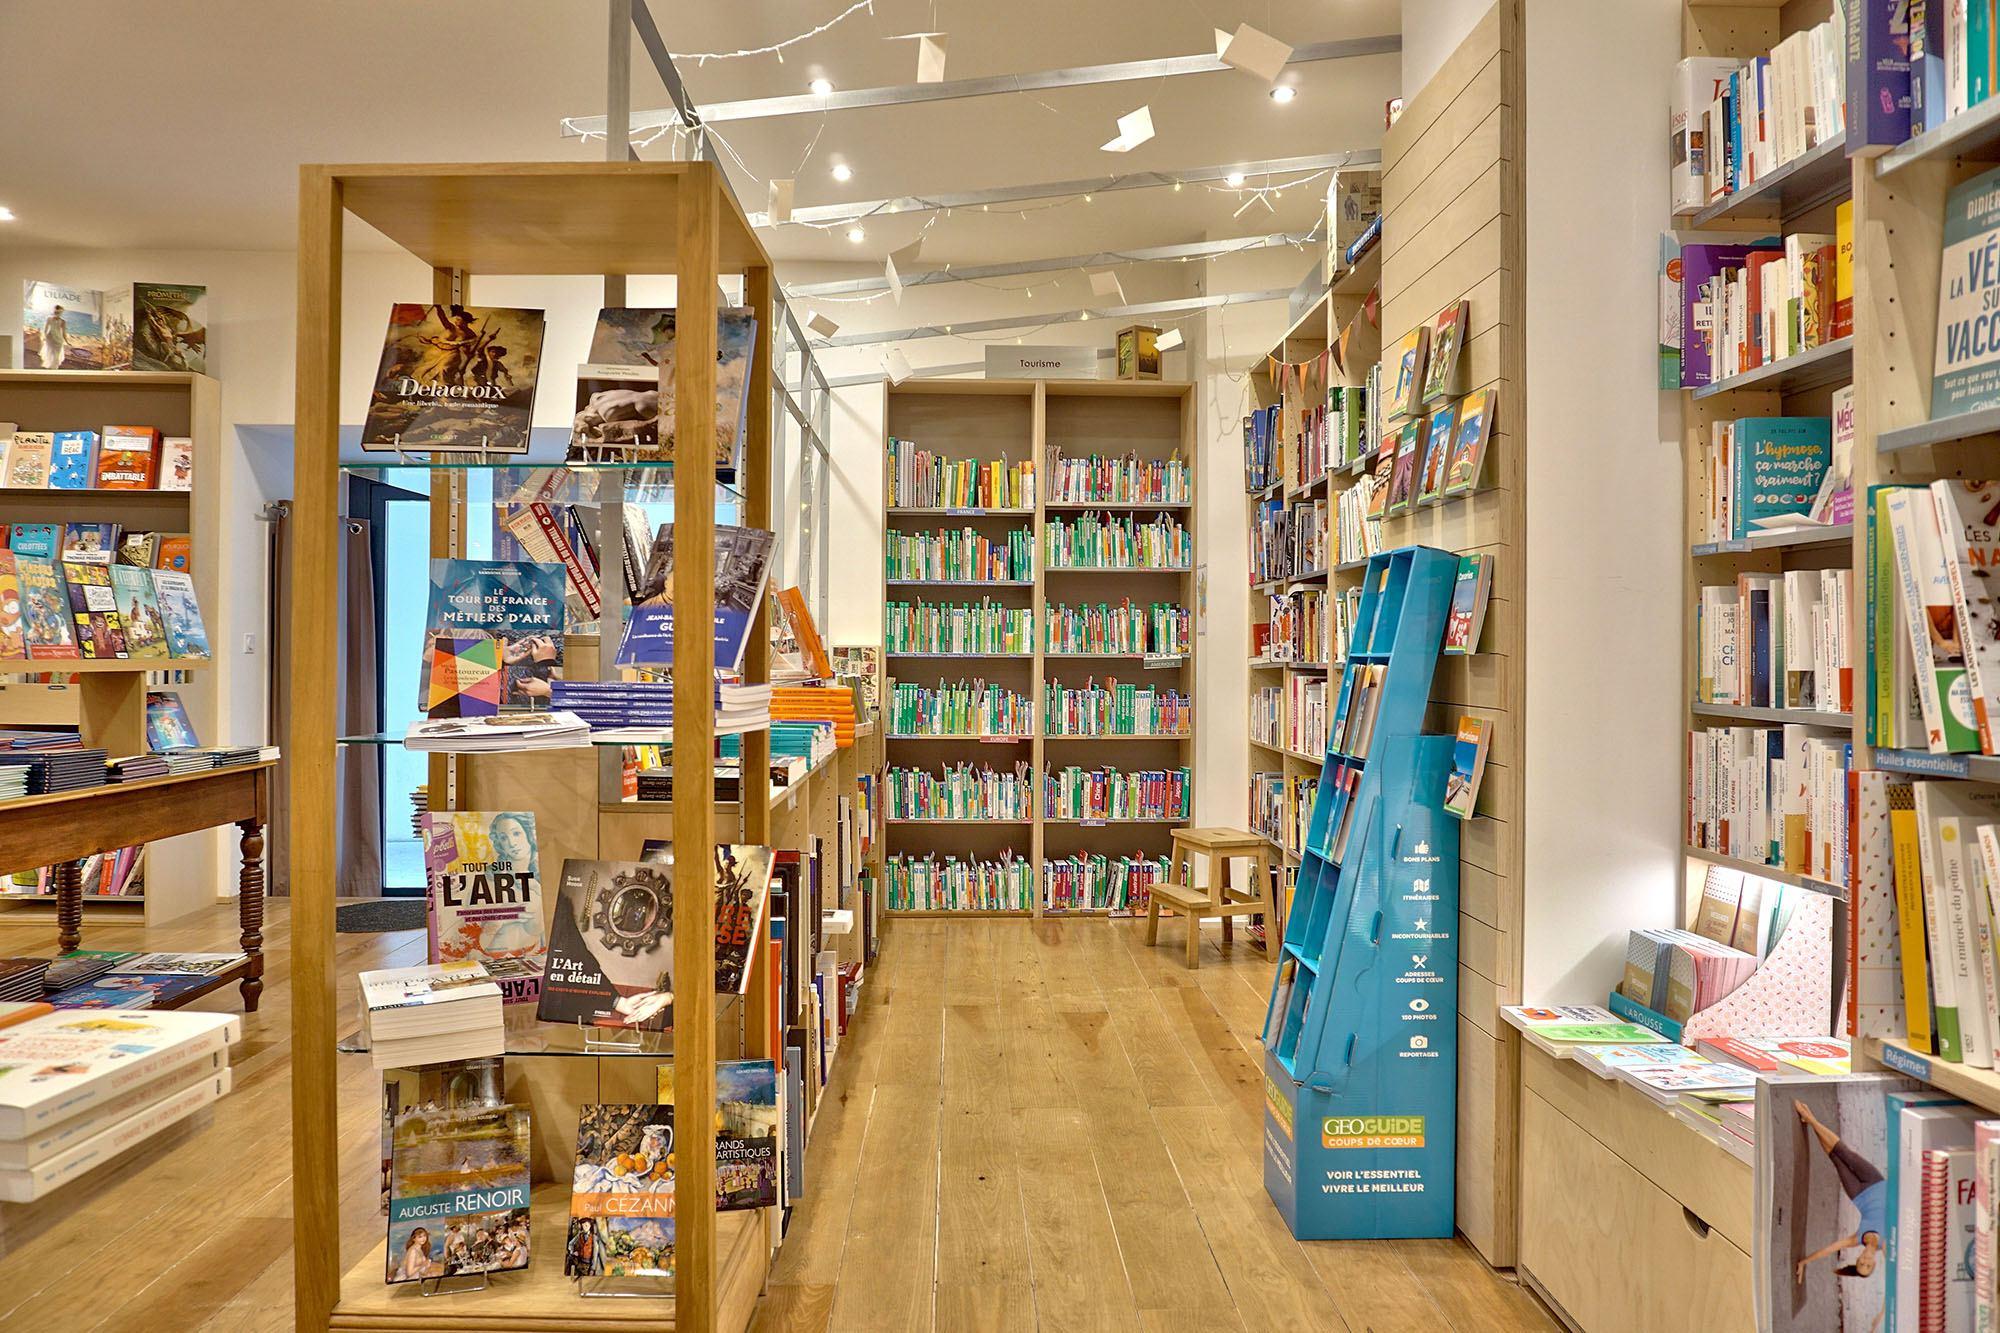 Rayon tourisme librairie La maison jaune